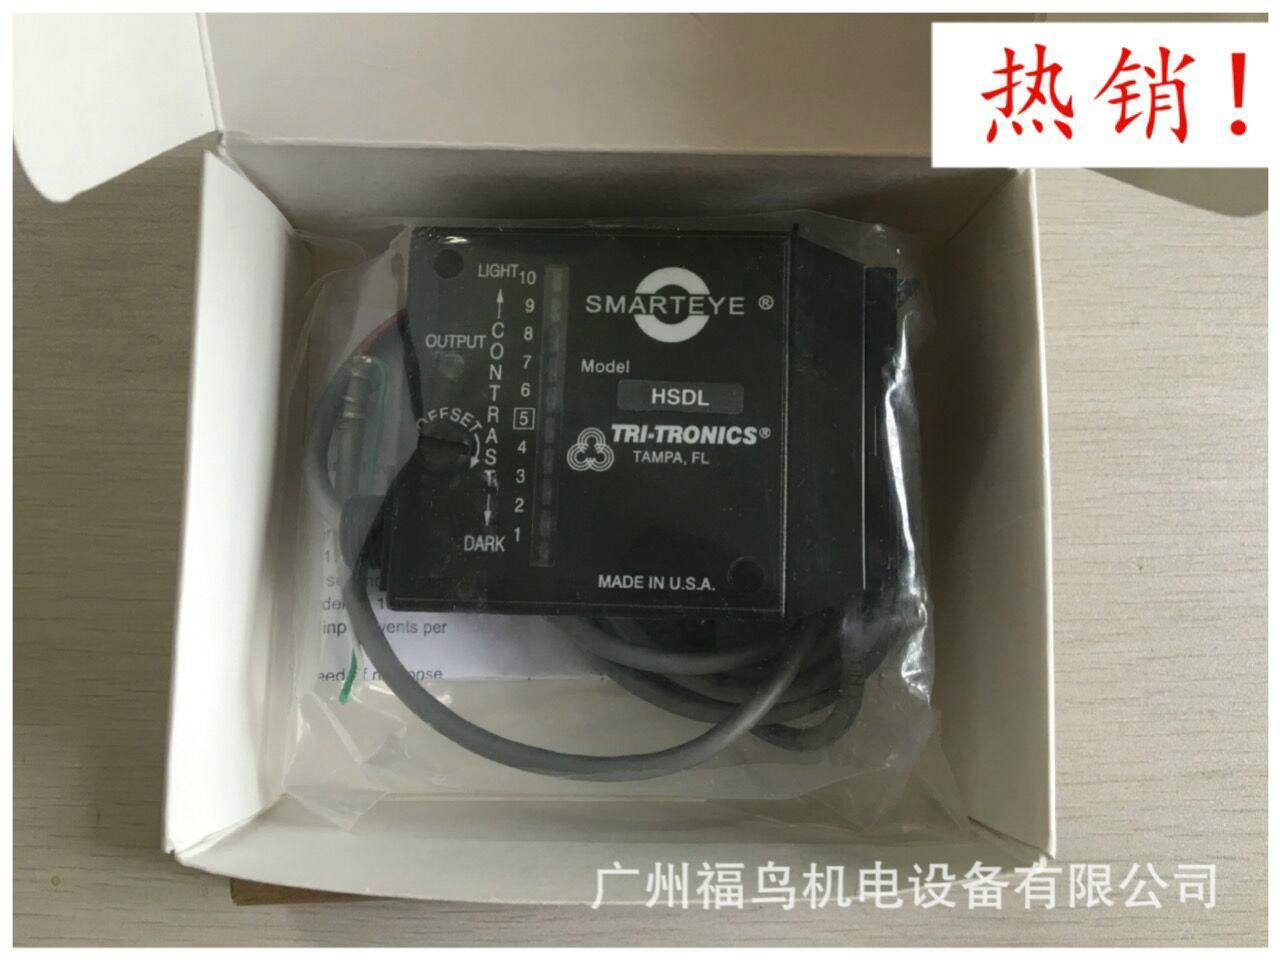 TRI-TRONICS傳感器, 型號: HSDLF1